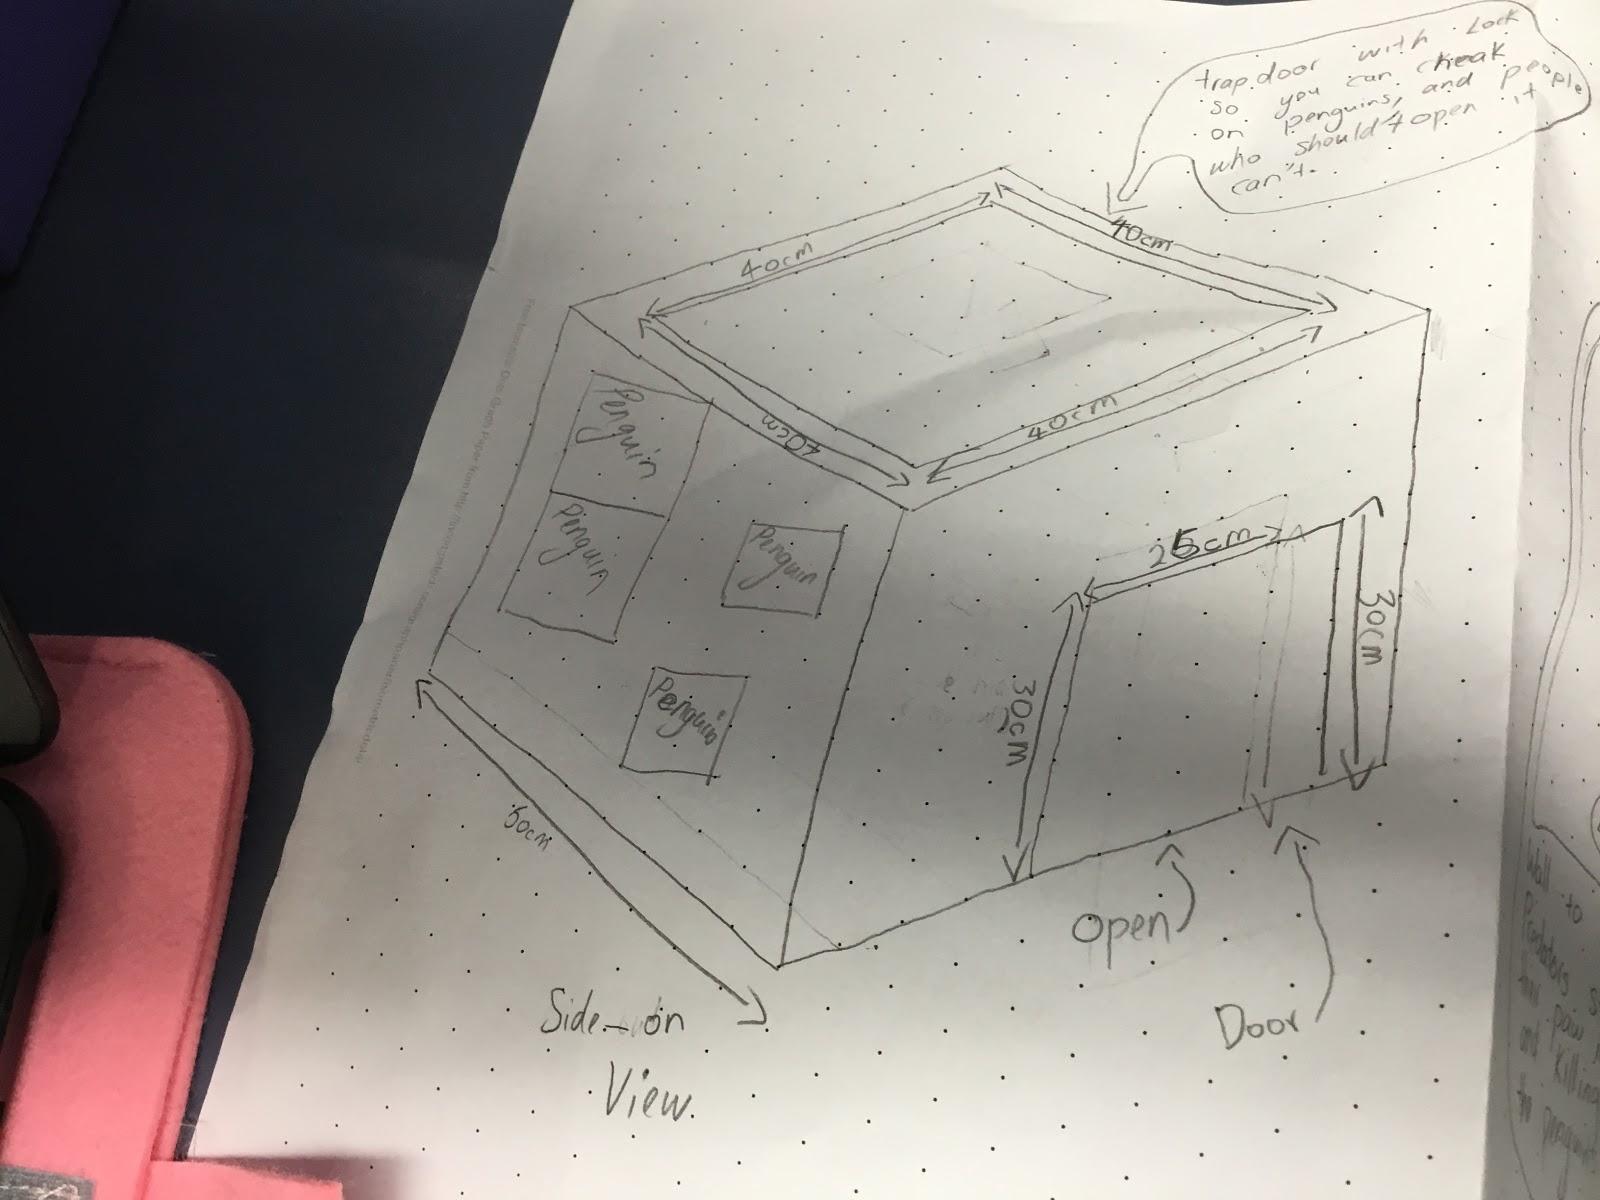 Secured trapdoor design by Vanessa and Stella